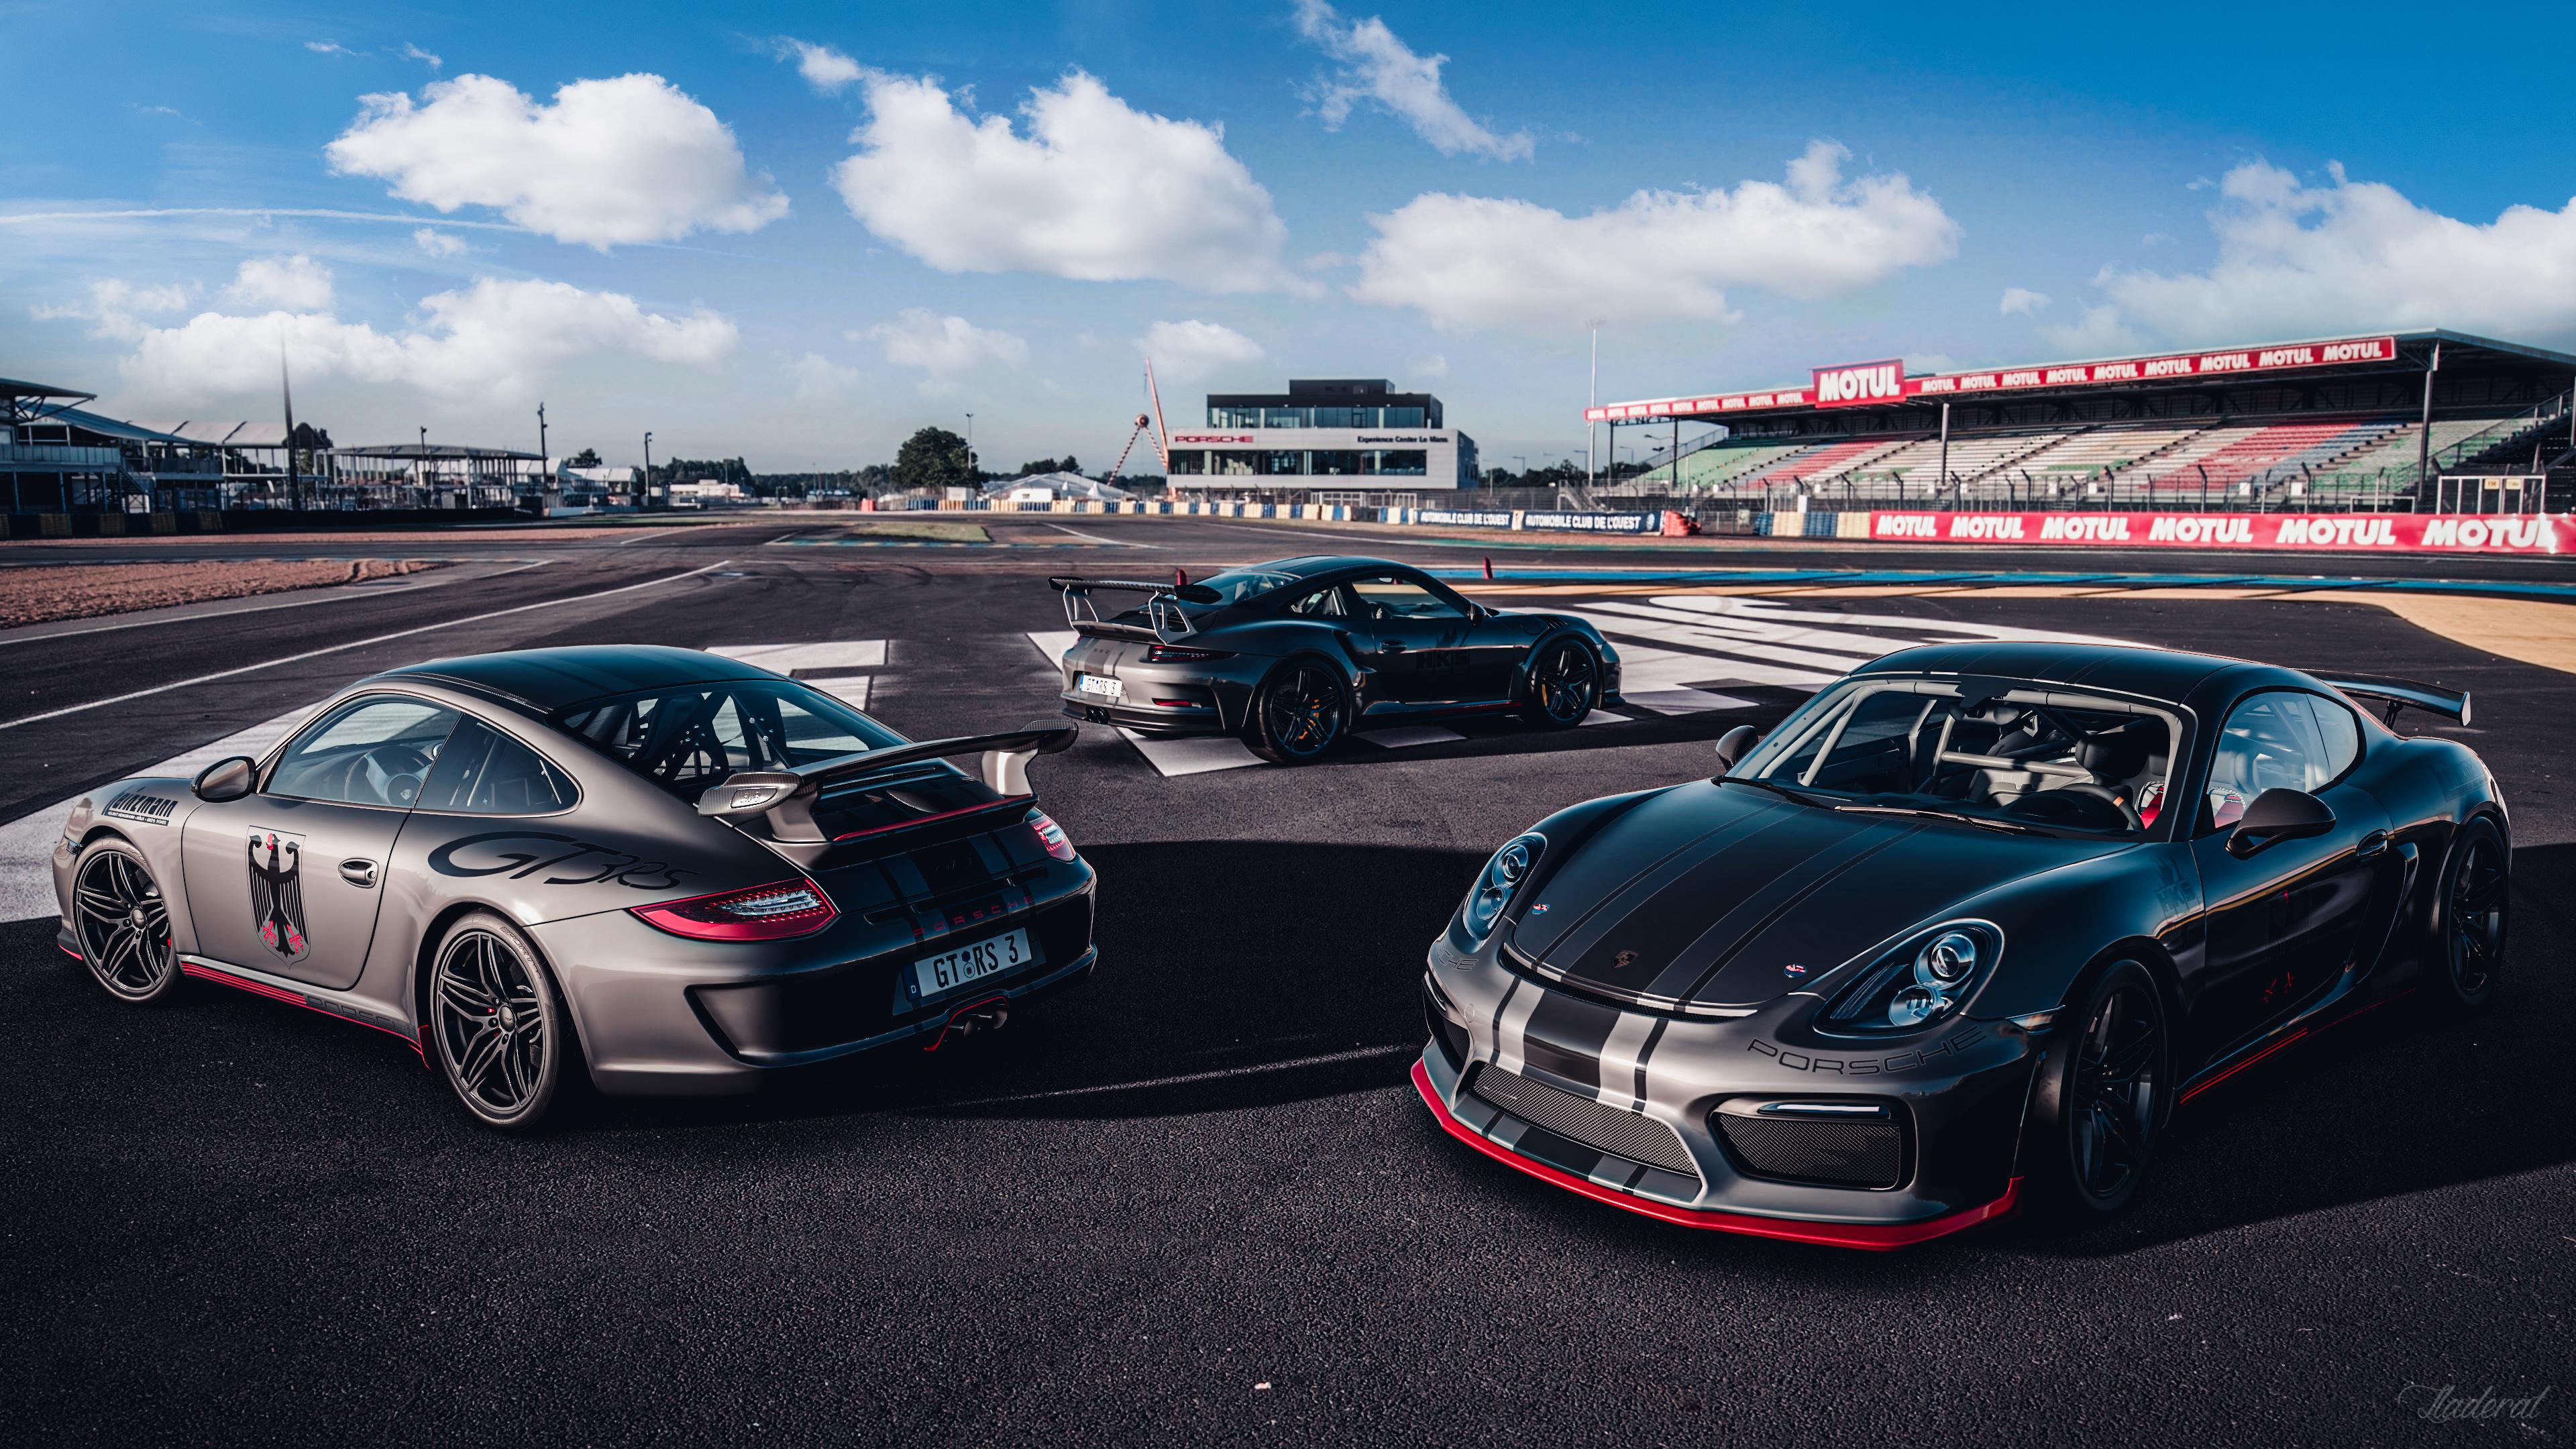 General 3840x2160 Porsche Porshe 911 GT3 Porsche Cayman GT4 Porsche Cayman Porsche 911 GT3 RS race tracks car German cars Gran Turismo Gran Turismo Sport PlayStation PlayStation 4 grey red black racing stripes livery